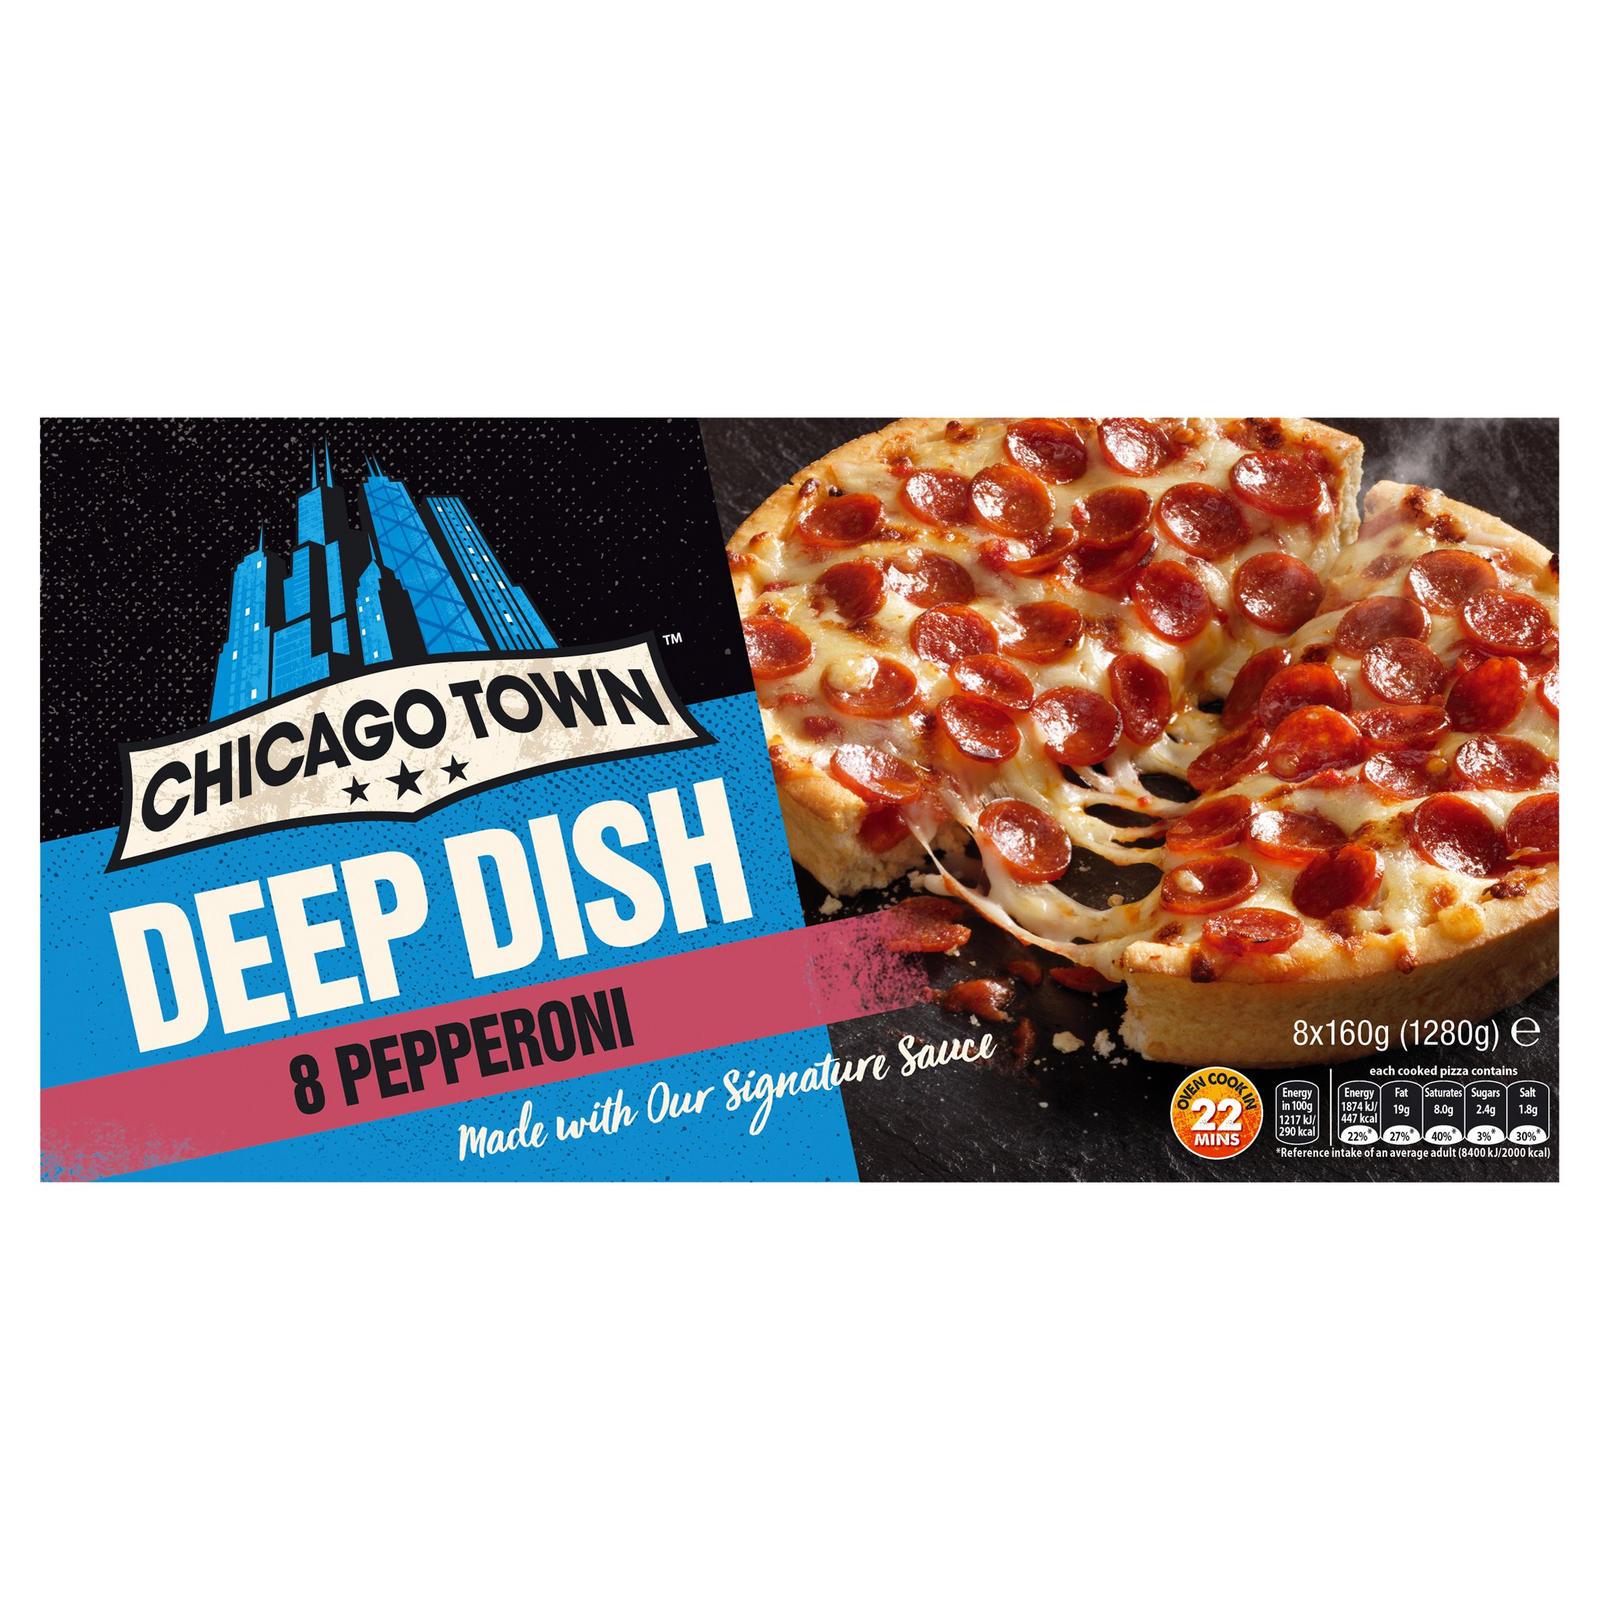 Chicago Town Deep Dish Pepperoni Pizzas 8 X 160g 1280g